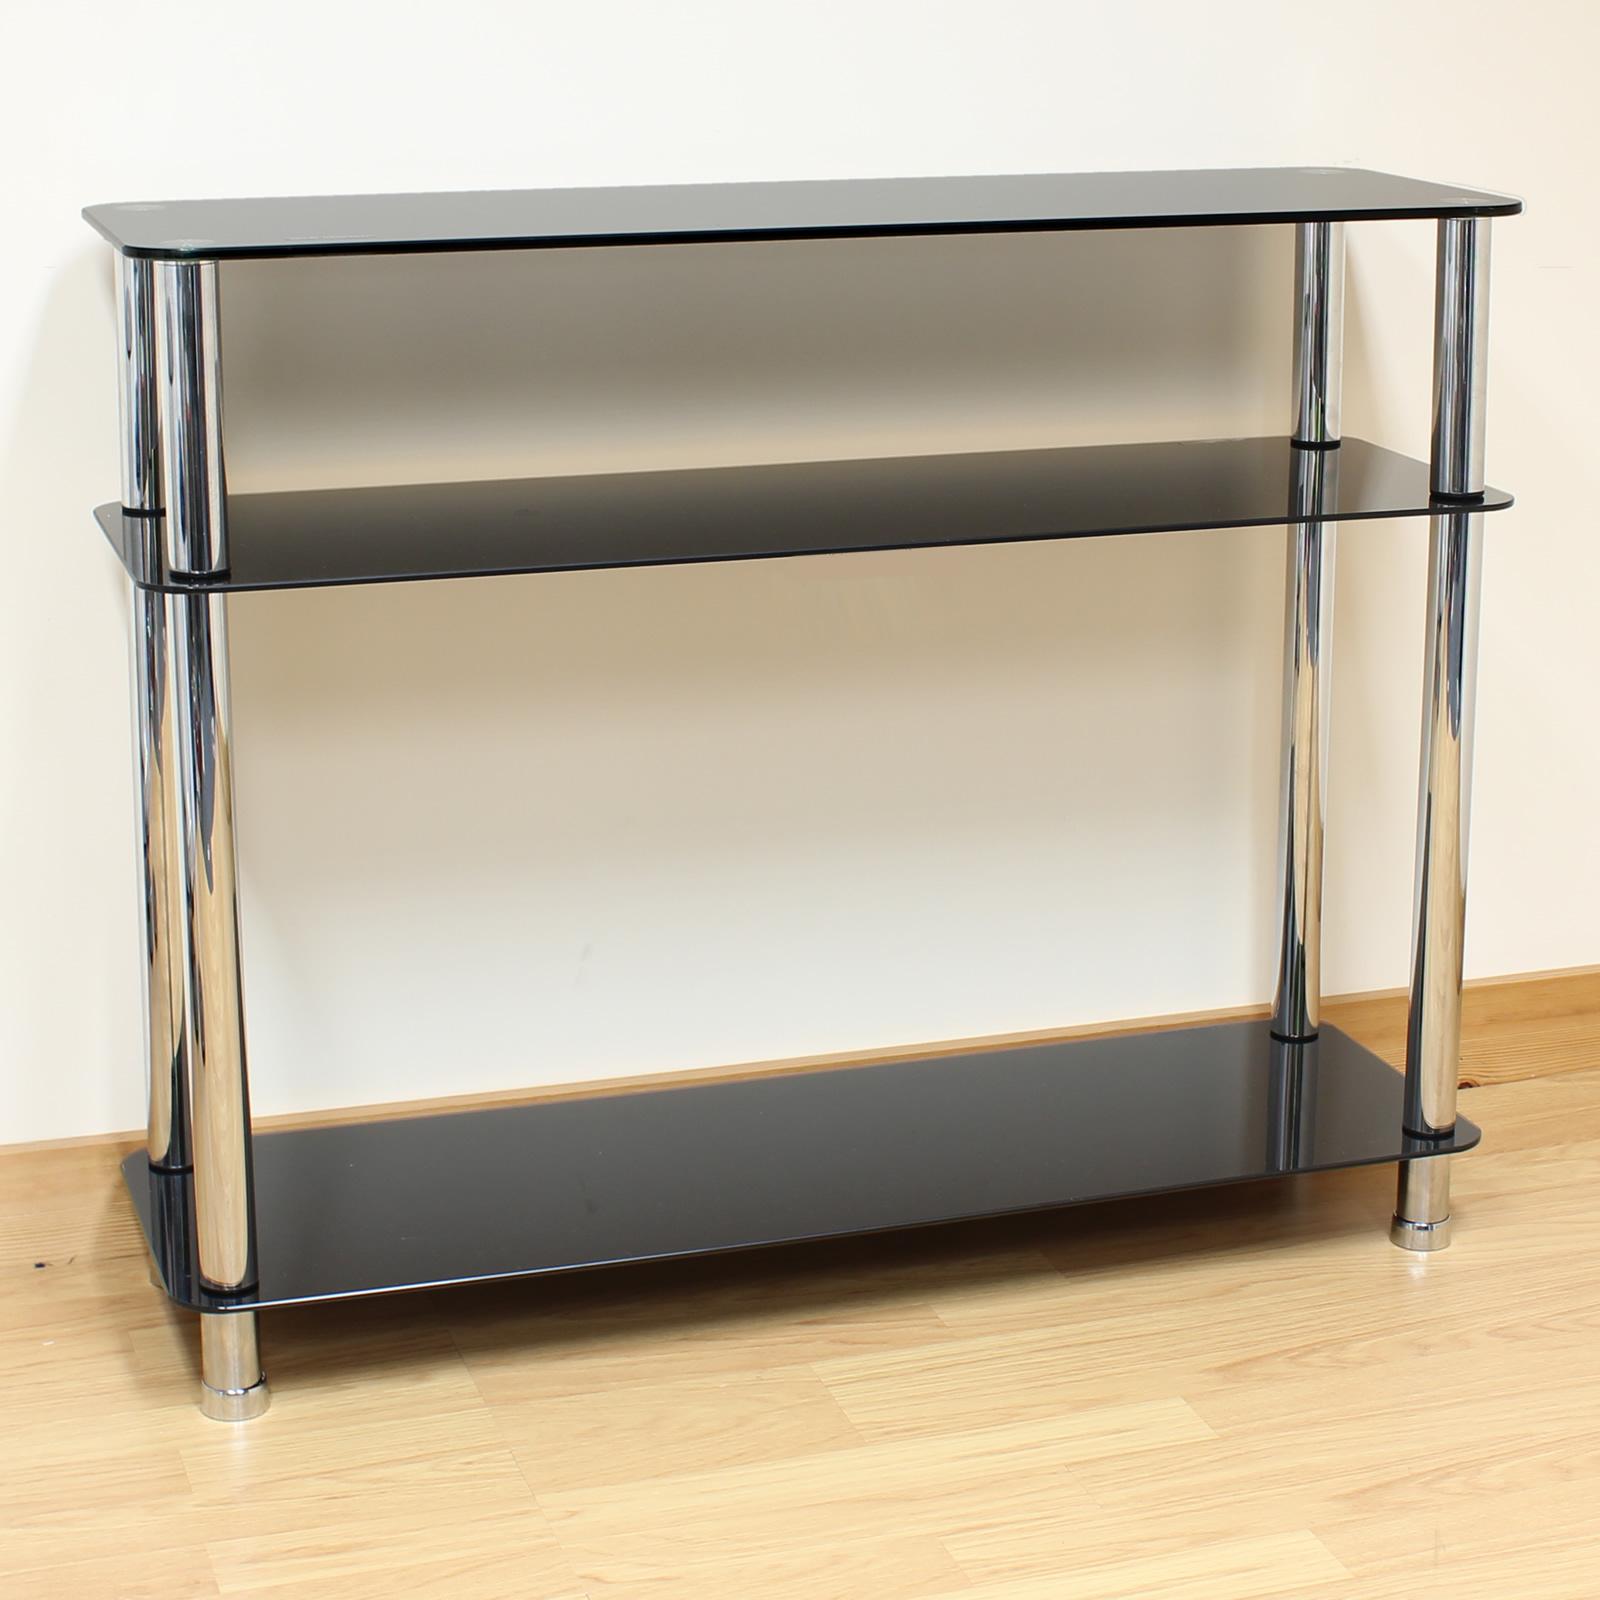 Hartleys 3 Tier Black Glass Side/Console Table Shelf Unit